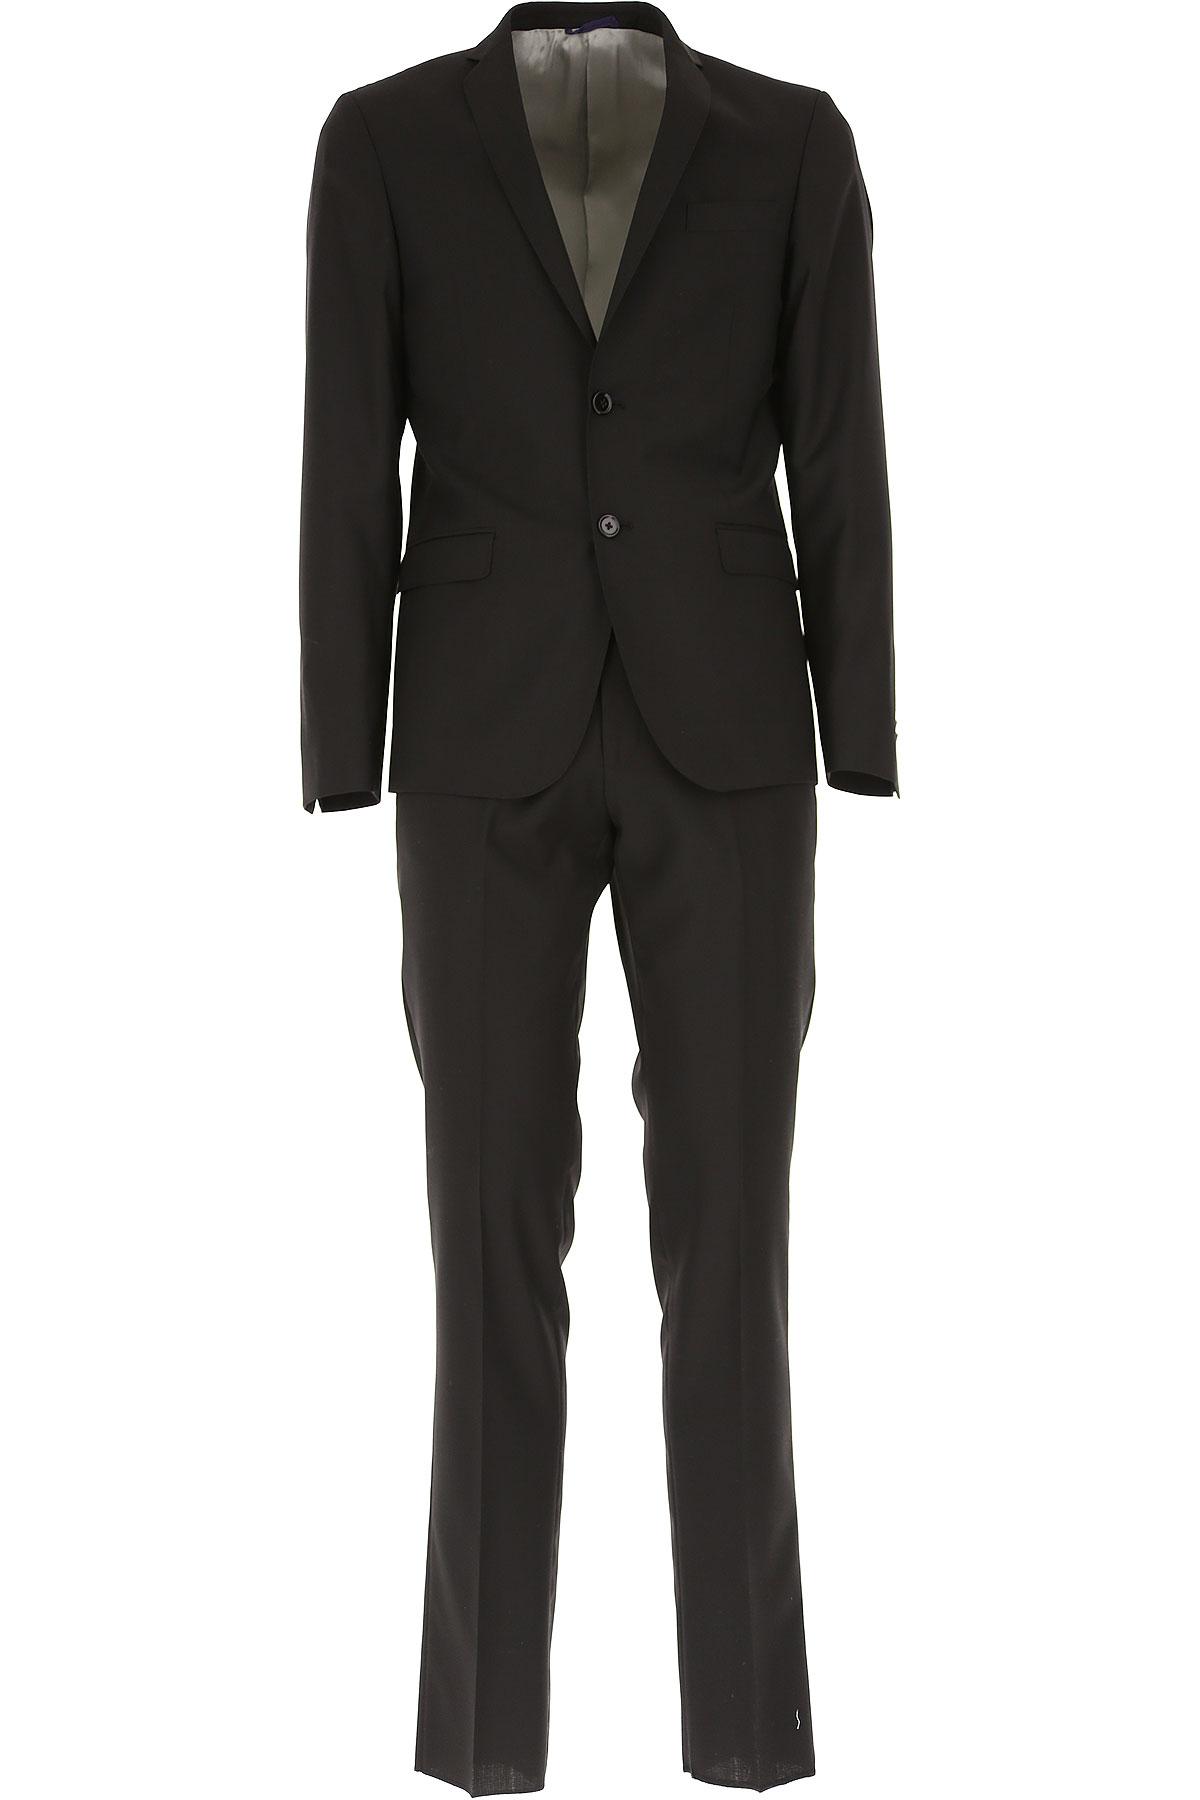 Simbols Men's Suit, Black, Wool, 2019, L M